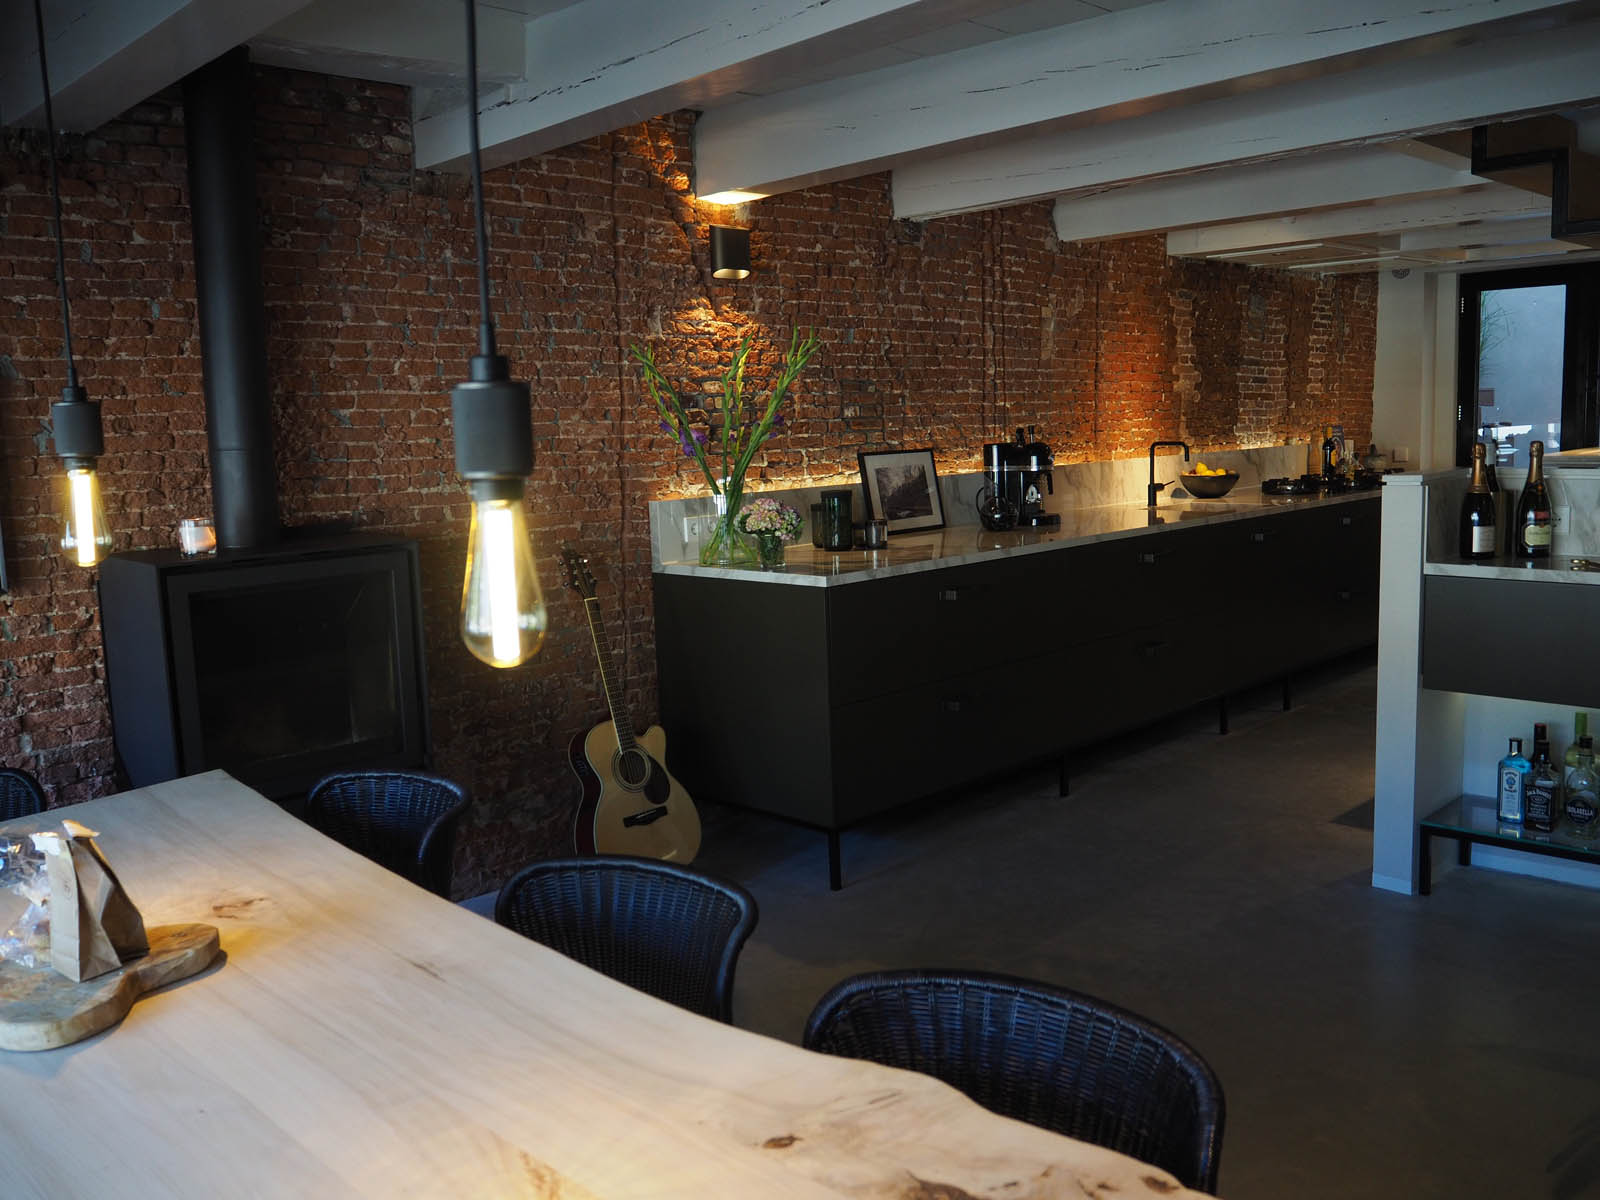 jordaan_amsterdam_grachtenpand_kitchen_view_jeroen_de_nijs_bni